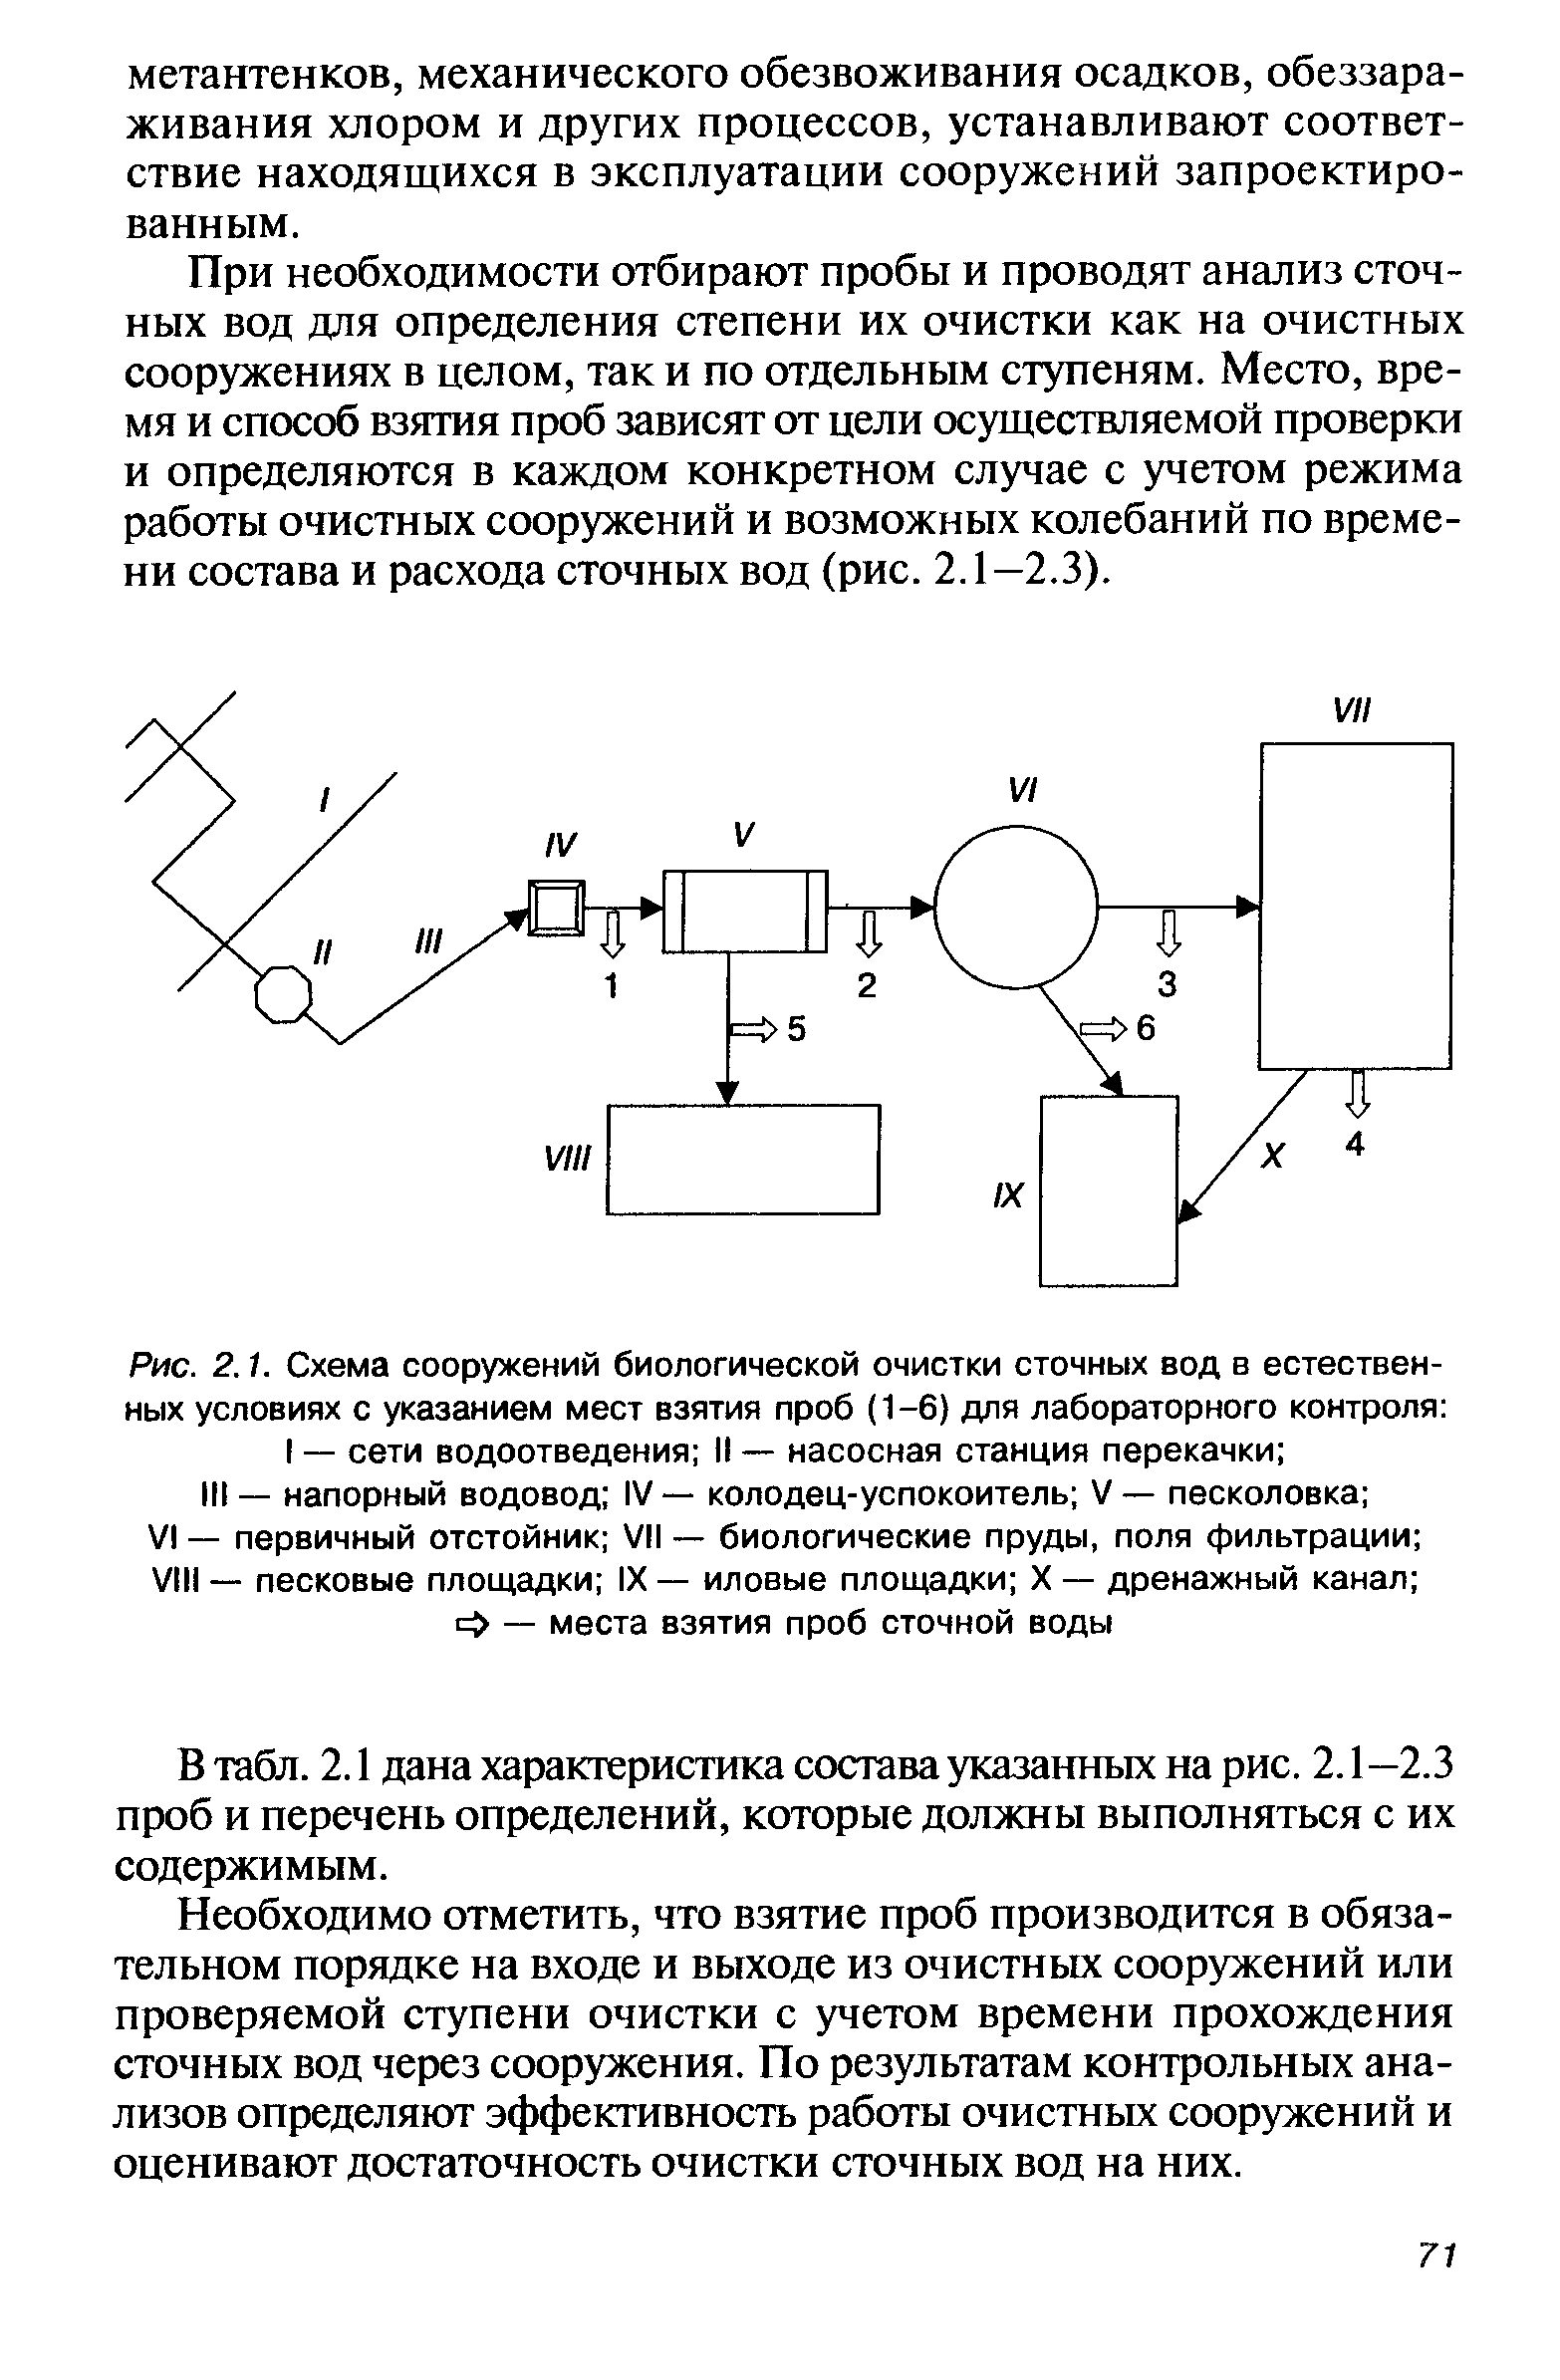 Химический анализ сточных вод предприятия